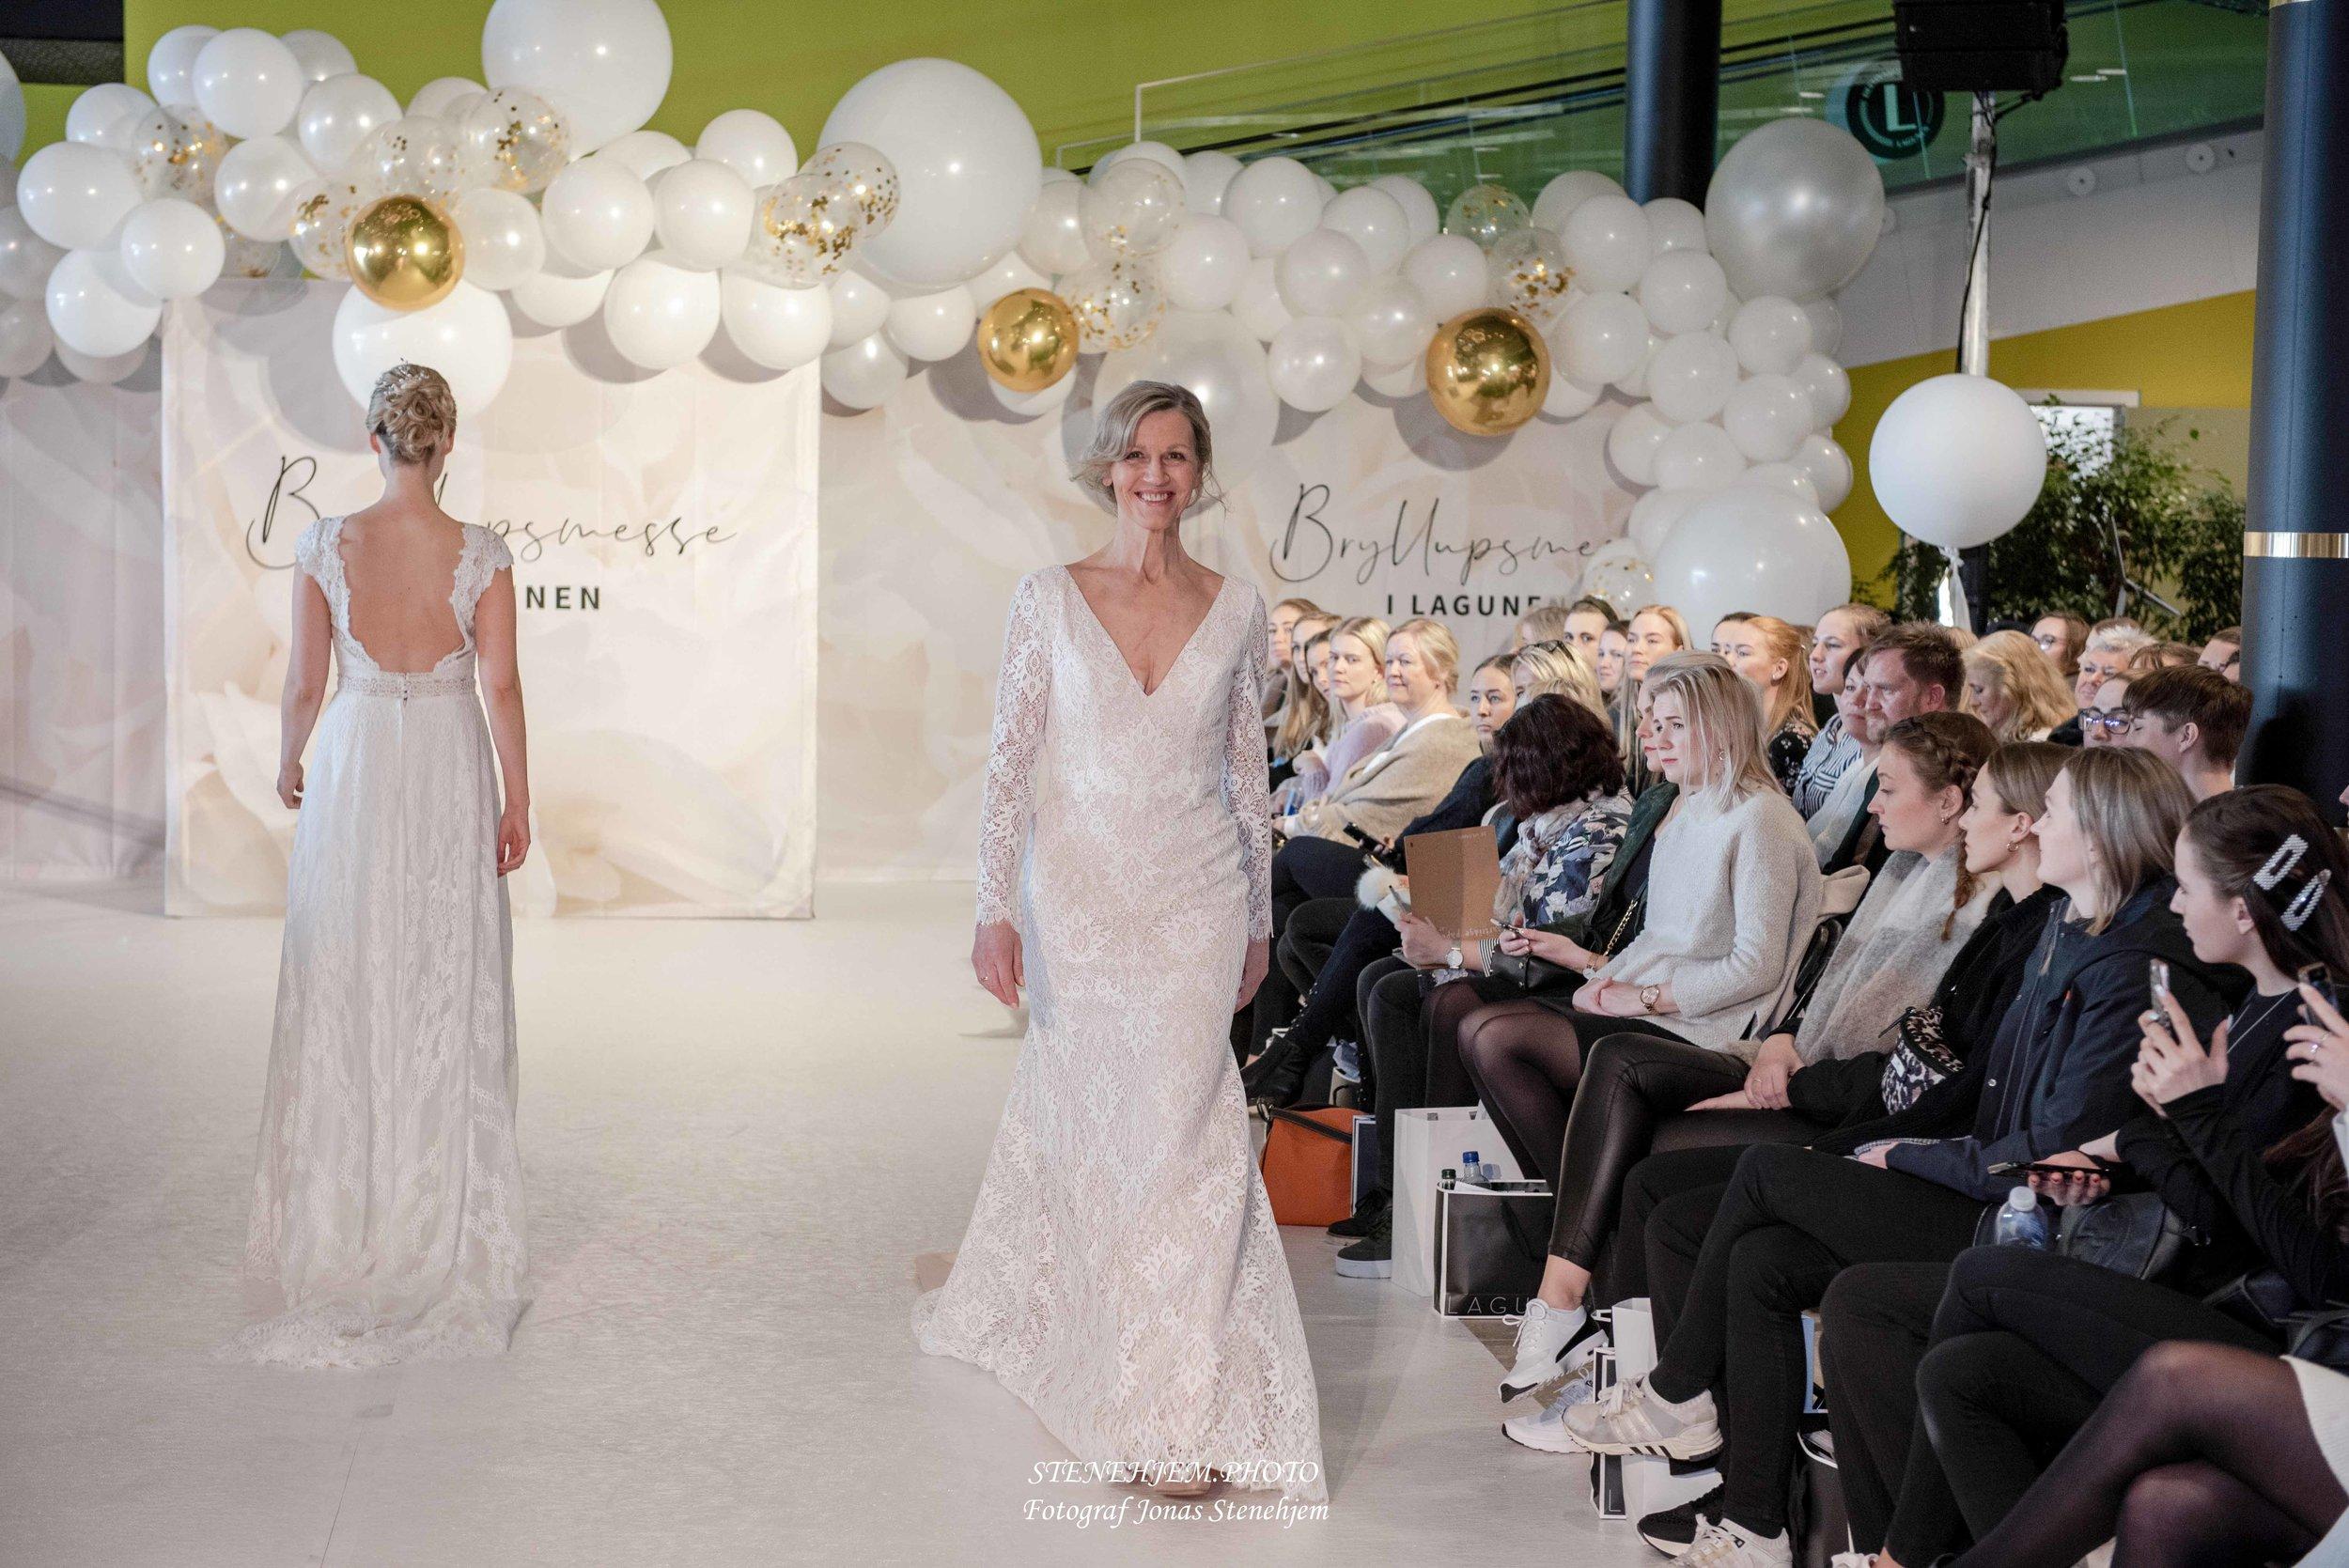 Bryllupsmesse_Lagunen_mittaltweddingfair__078.jpg